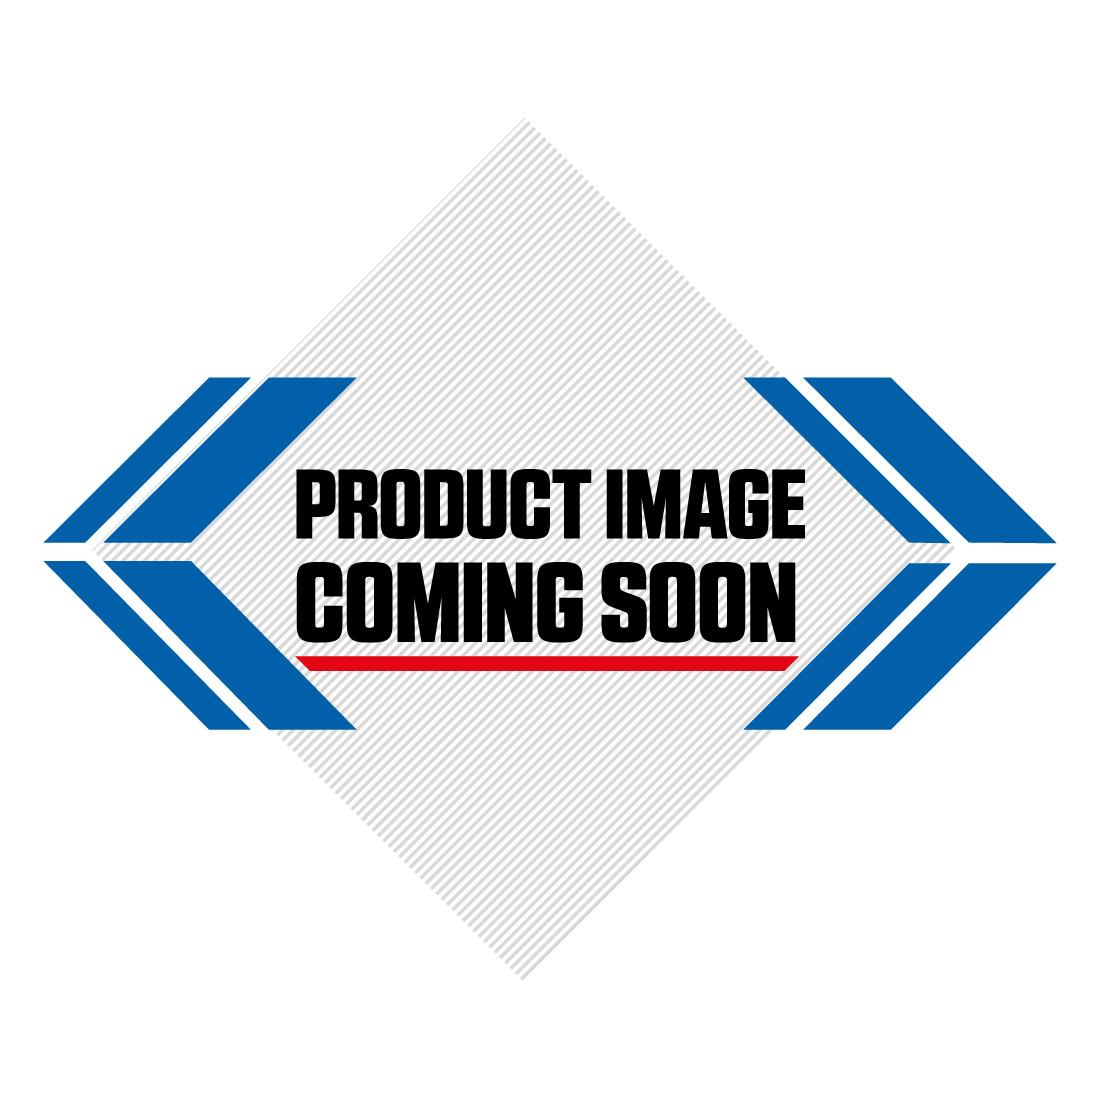 Honda Plastic Kit CRF 230 (15-20) OEM Factory Image-2>